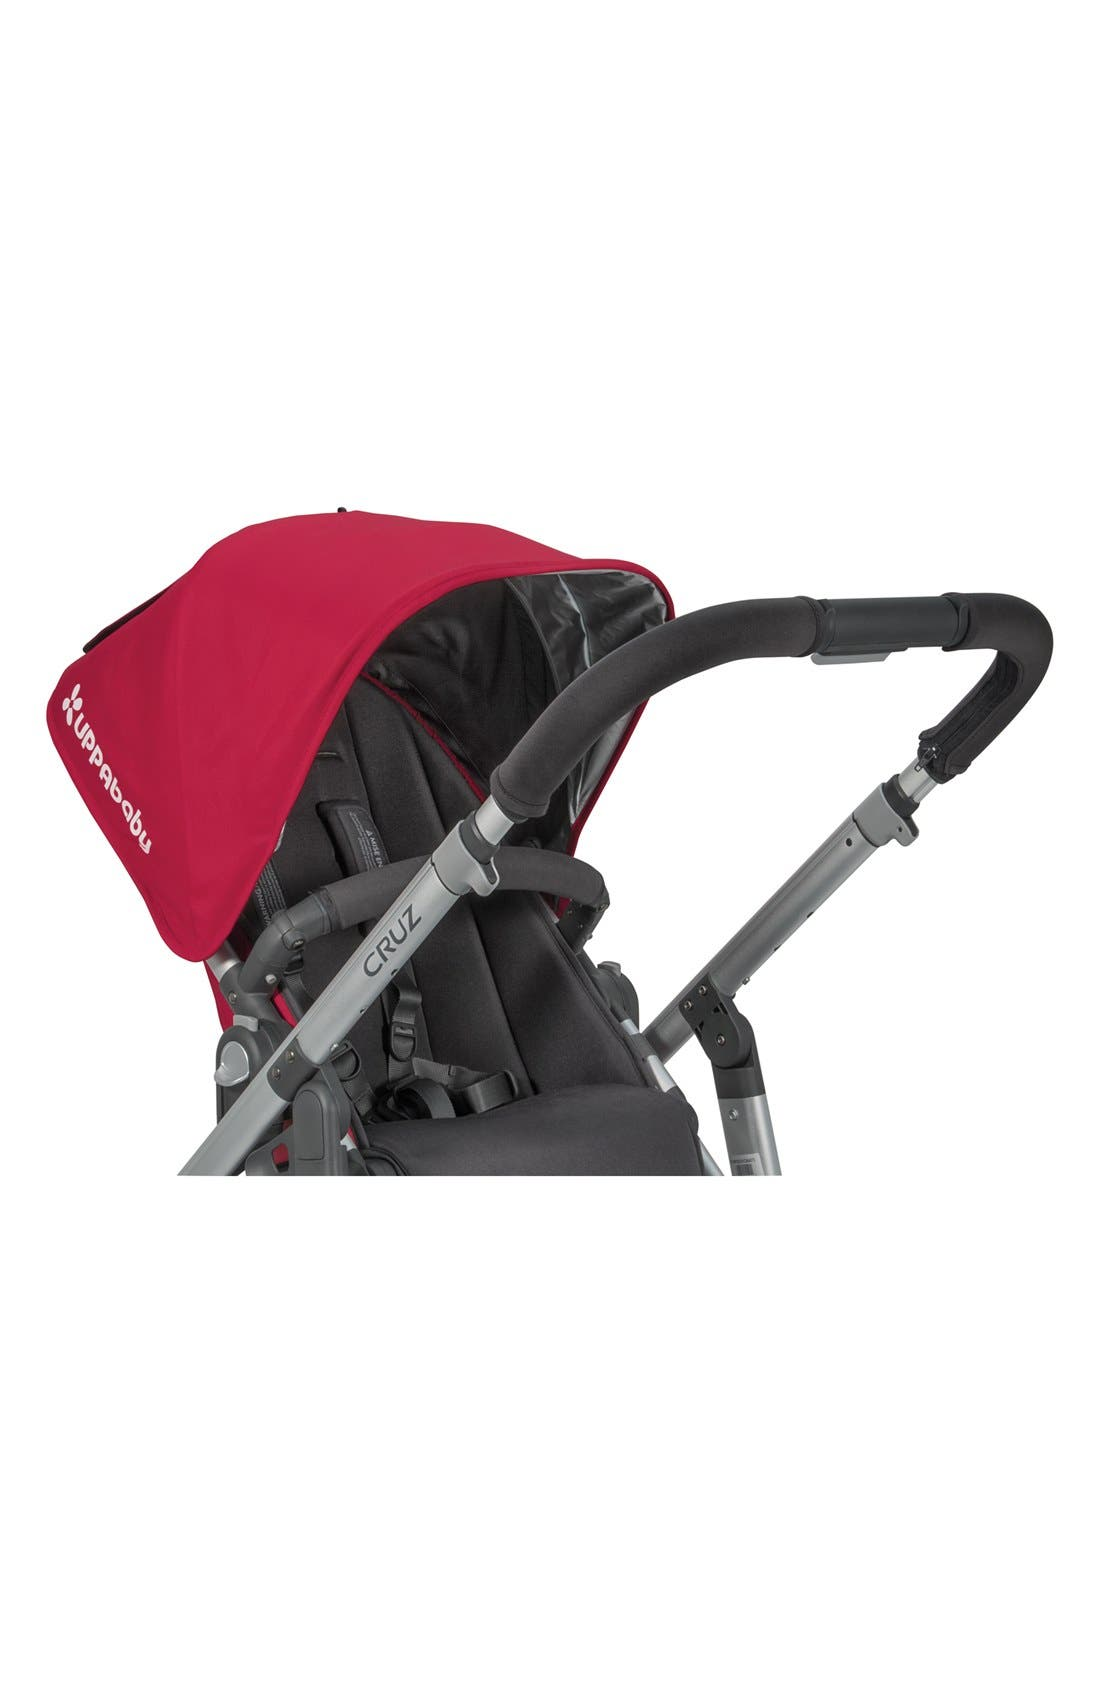 UPPAbaby CRUZ Stroller Handlebar Cover